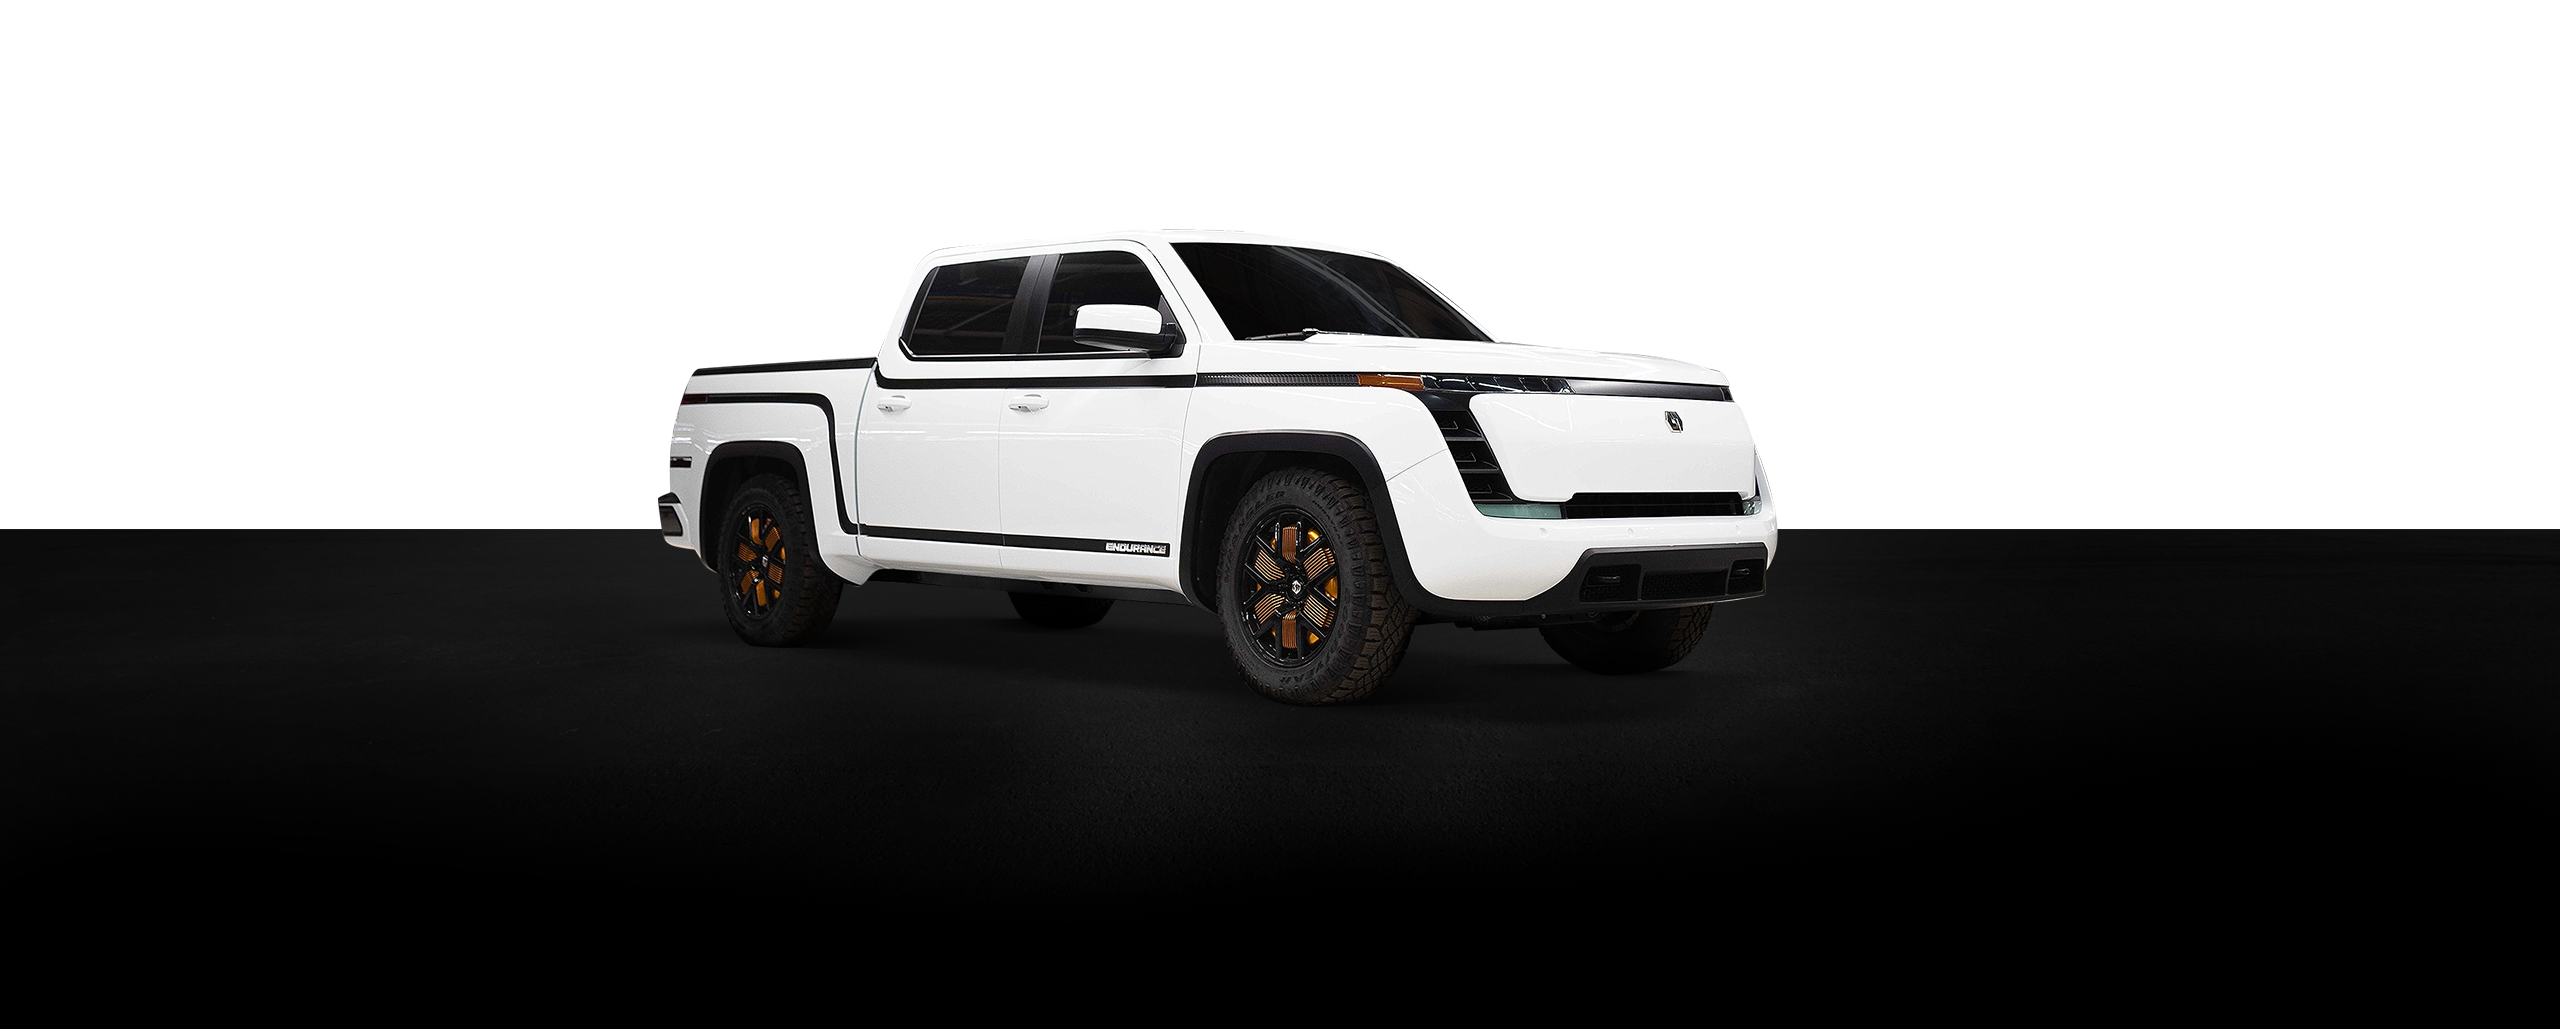 Lordstown Endurance logo and pickup truck below